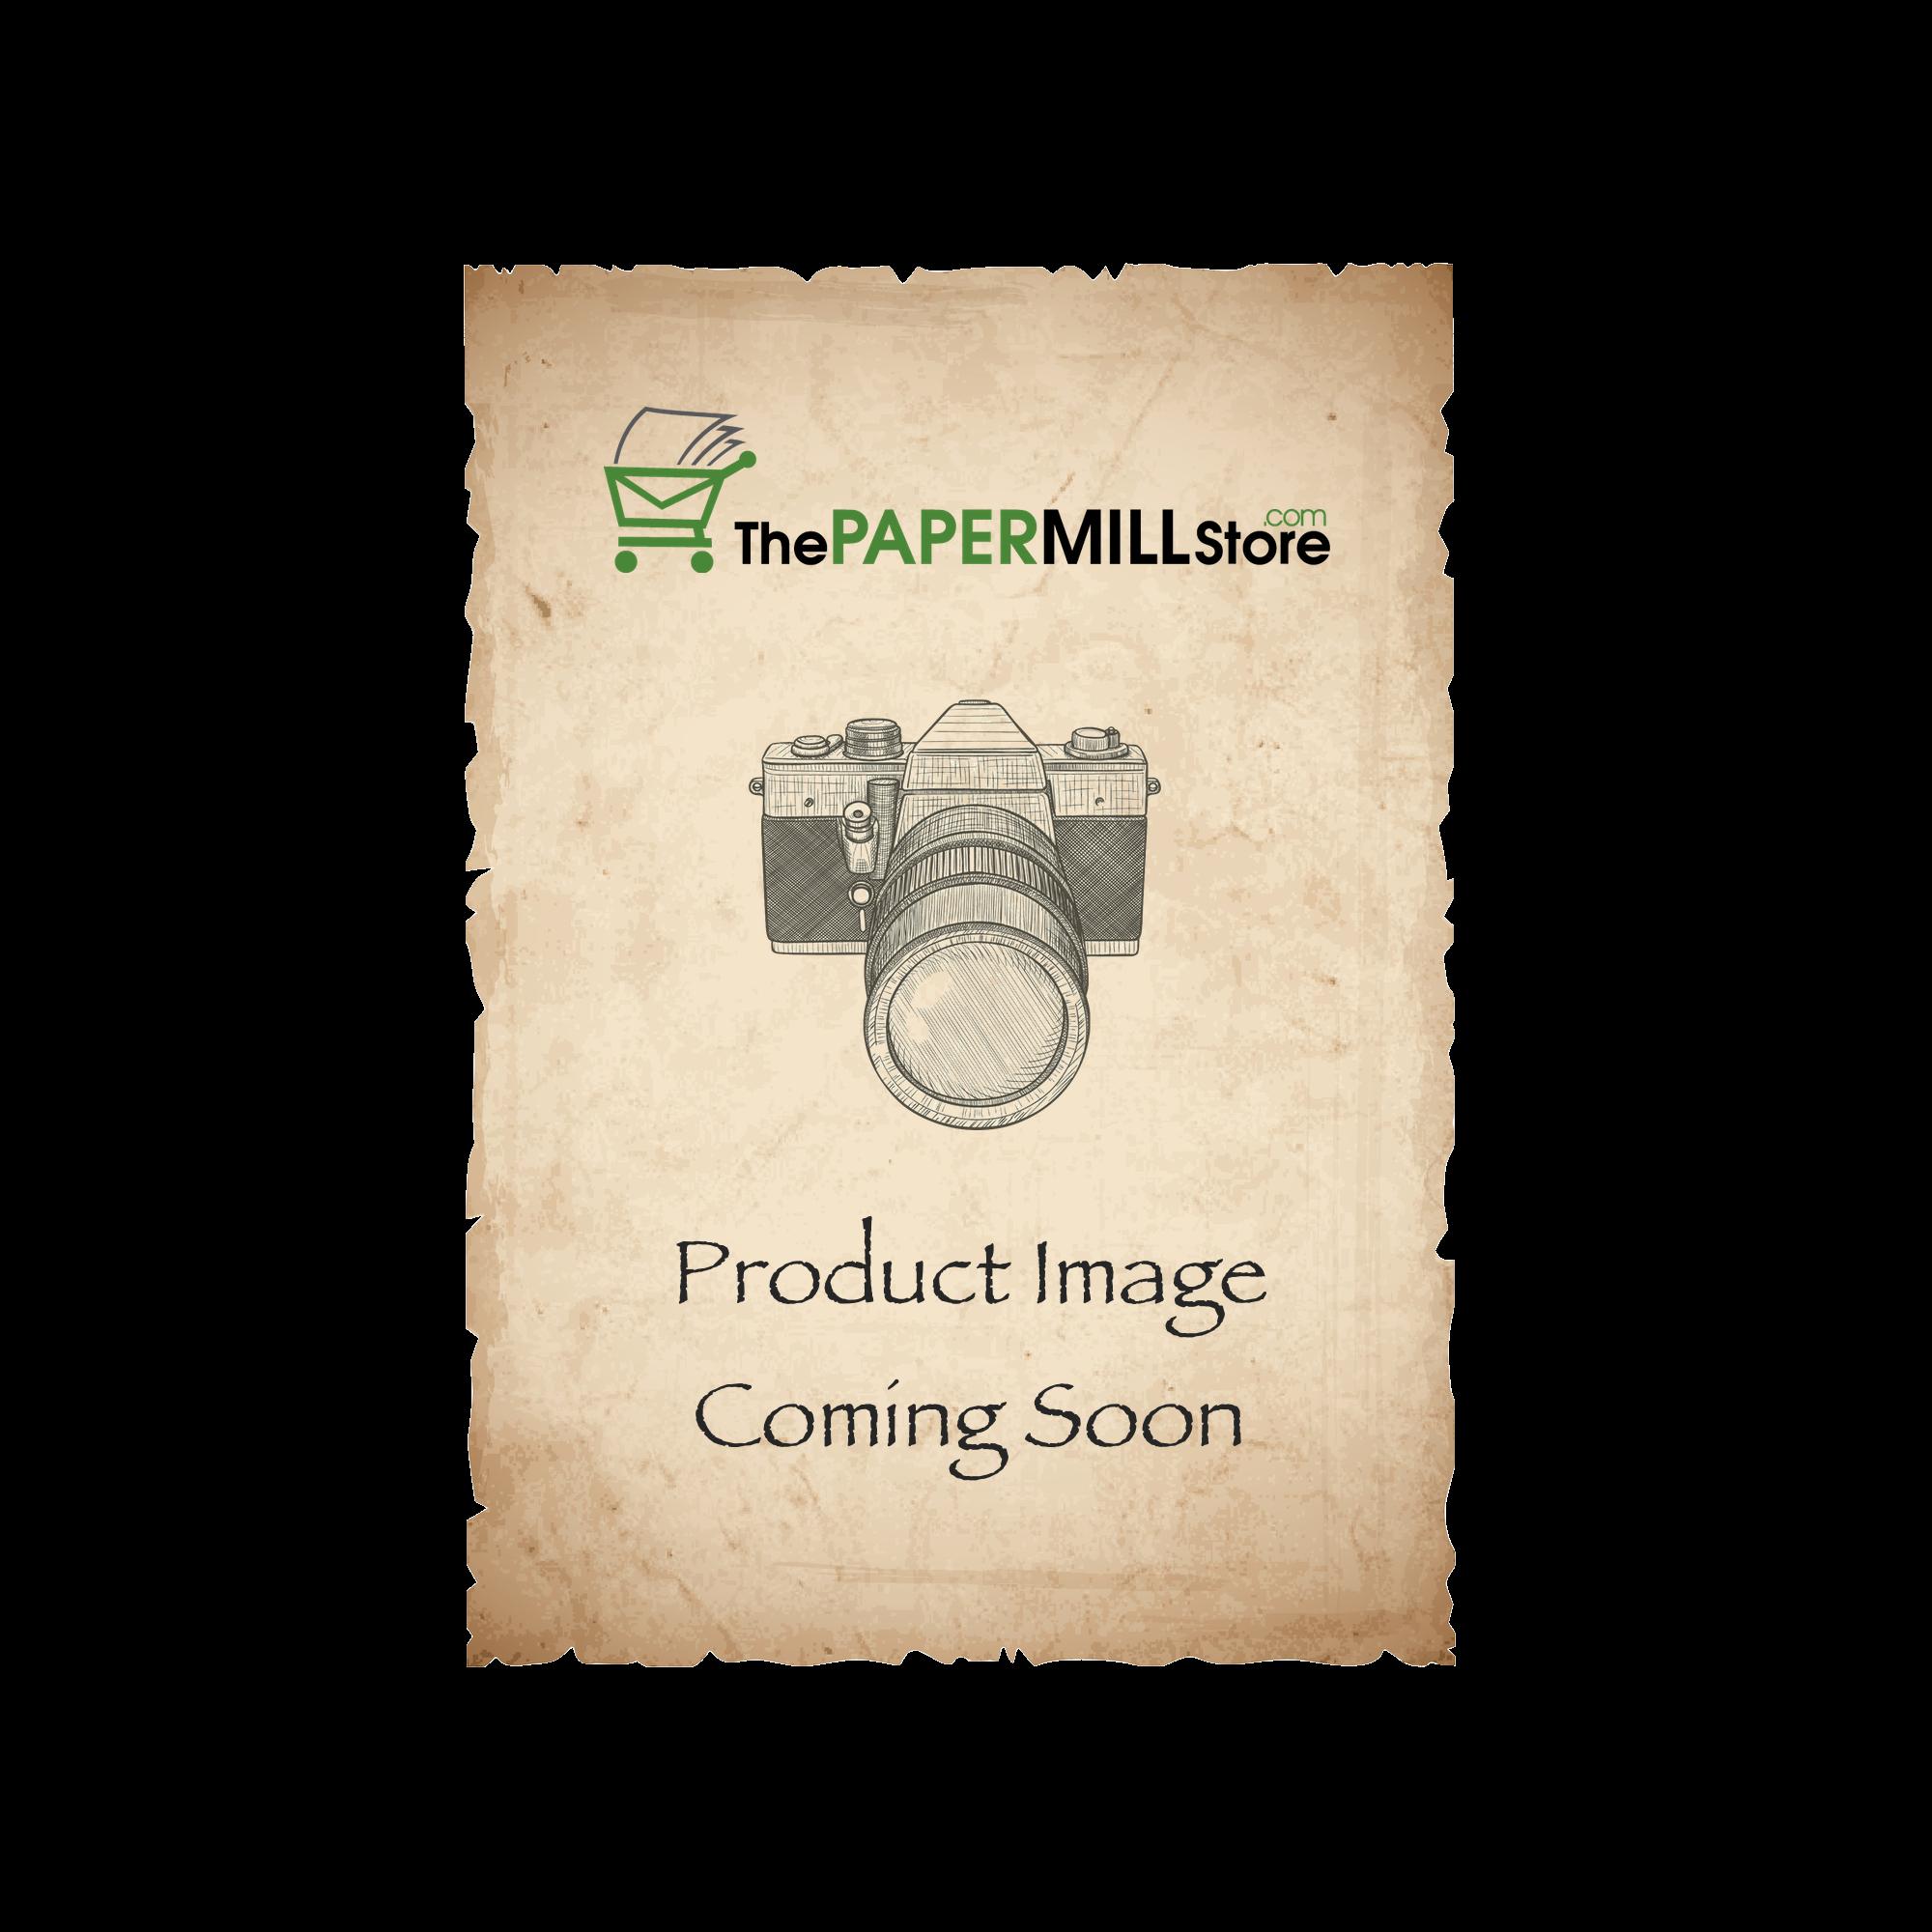 Cascata Indigo Card Stock - 8 1/2 x 11 in 80 lb Cover Felt 25 per Package